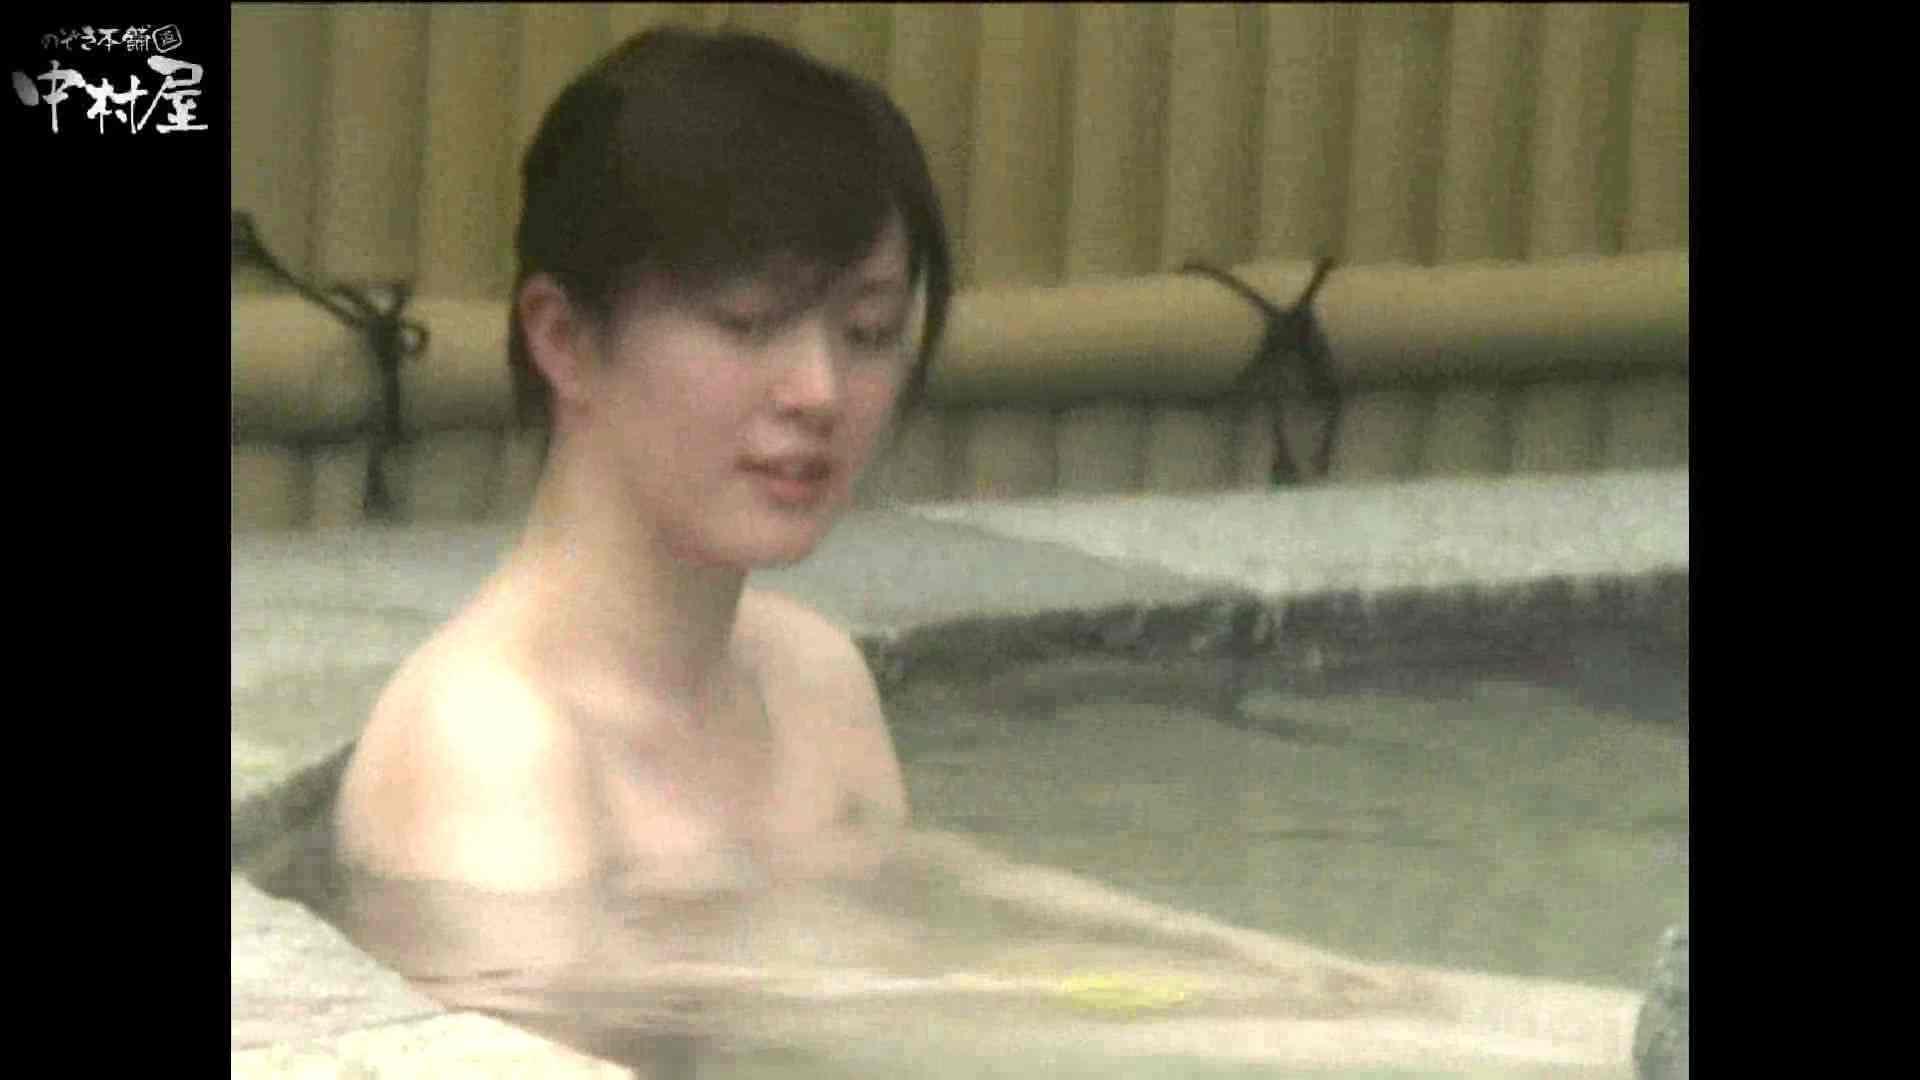 Aquaな露天風呂Vol.875潜入盗撮露天風呂十一判湯 其の一 盗撮師作品  96pic 40